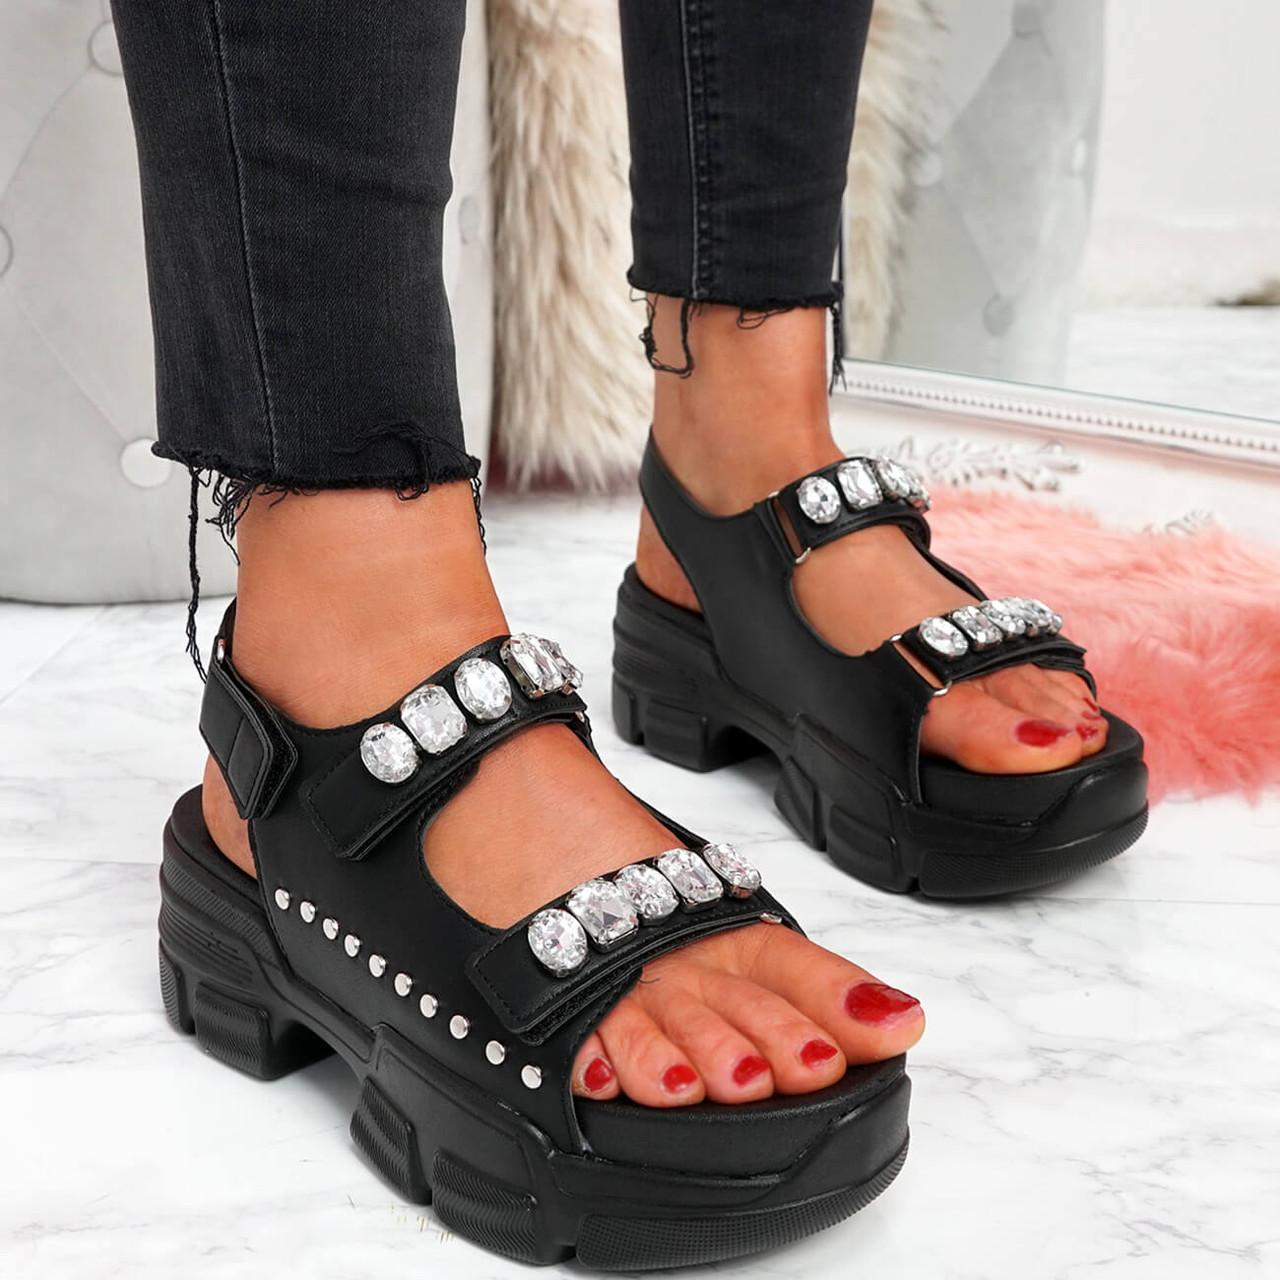 Hevy Black Rhinestone Chunky Sandals